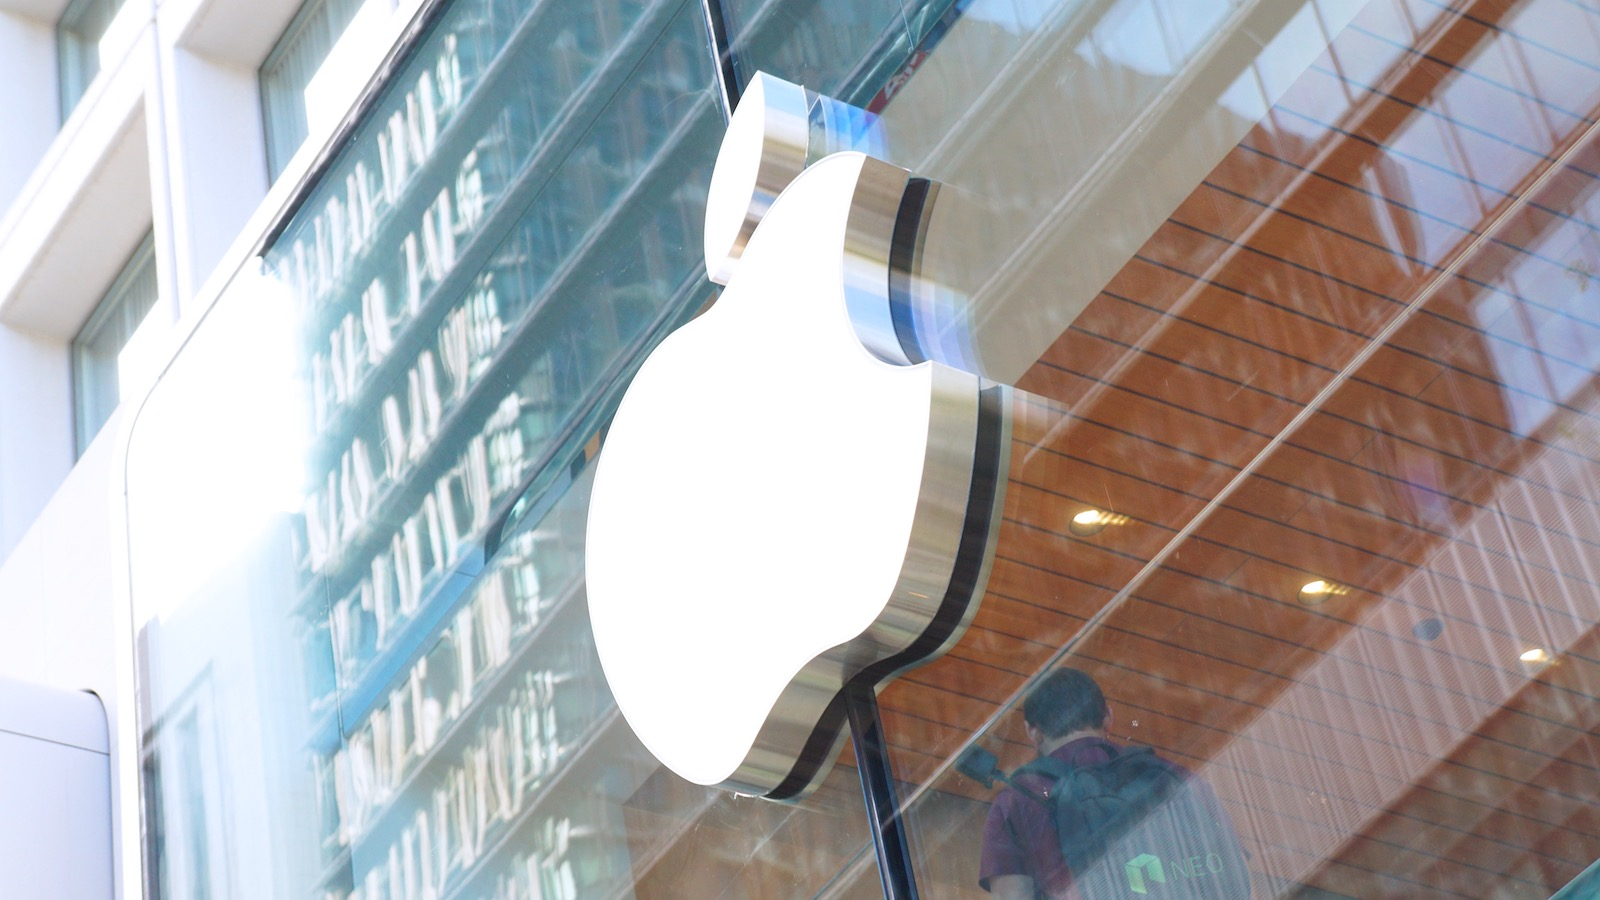 Apple、新型iPad Airや2種類のApple Watchなど多数の新製品を今秋発表か